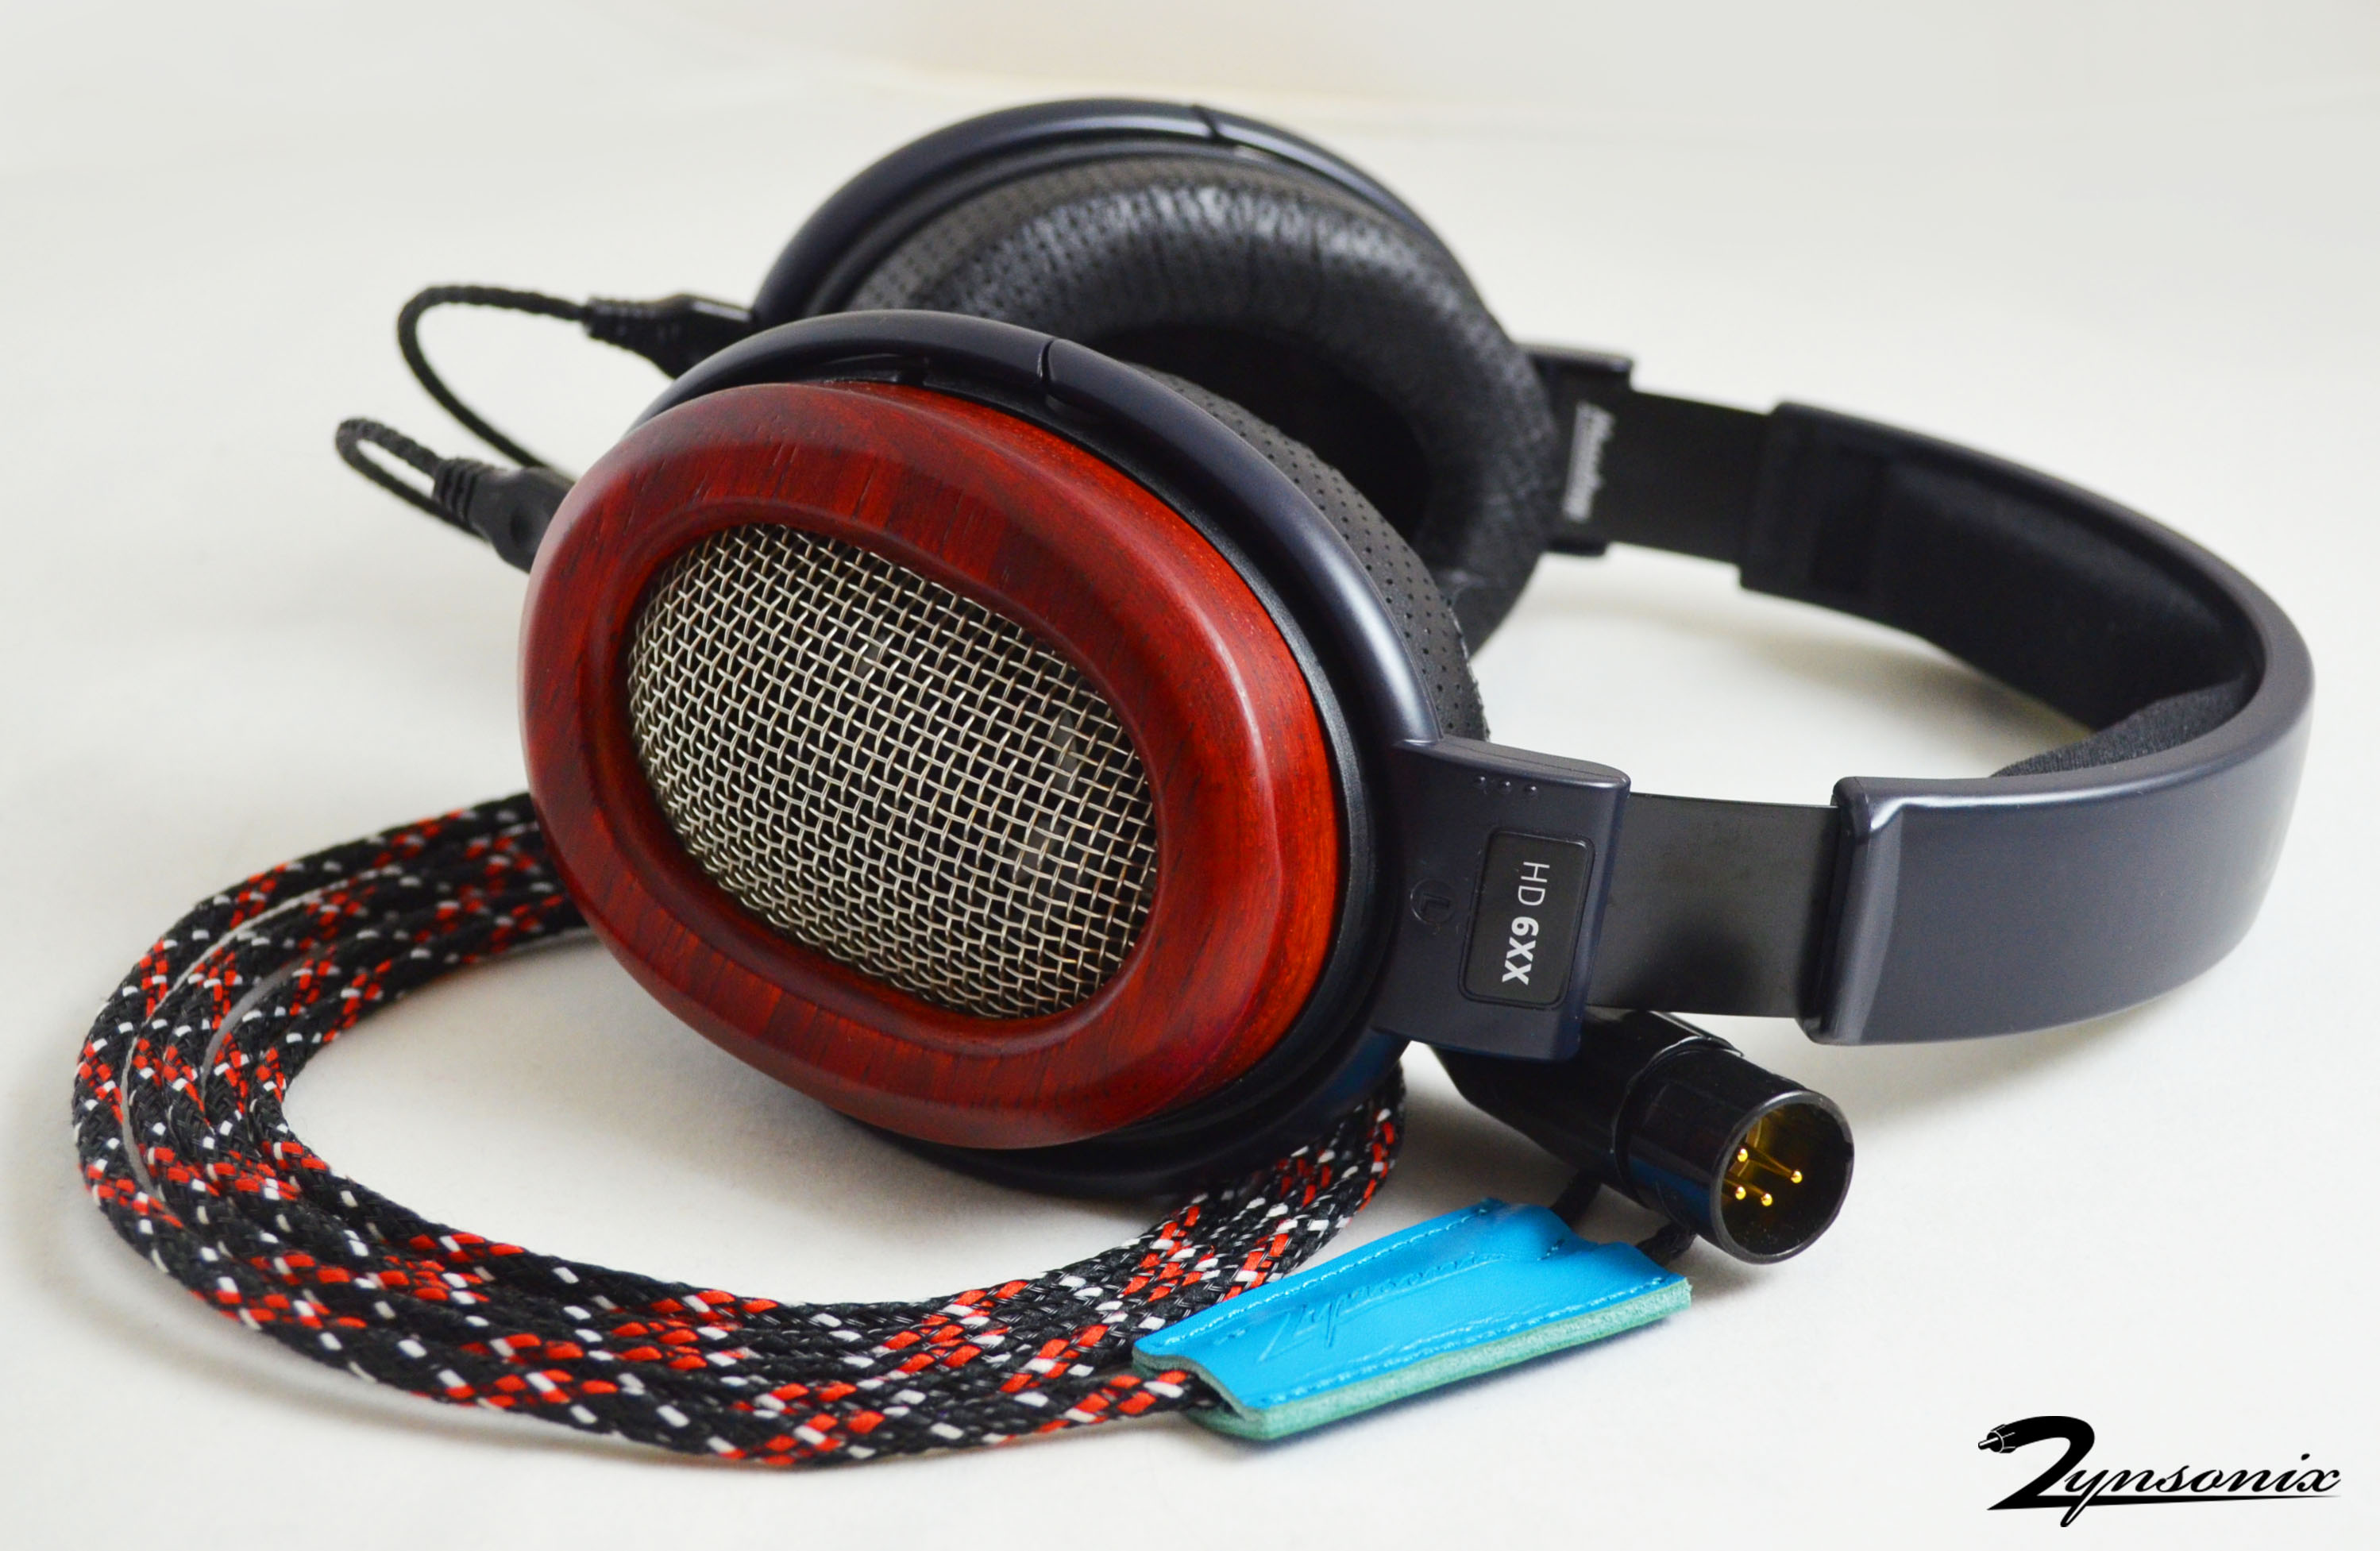 Headphone Cable For Sennheiser Hd600 Hd650 Hd580